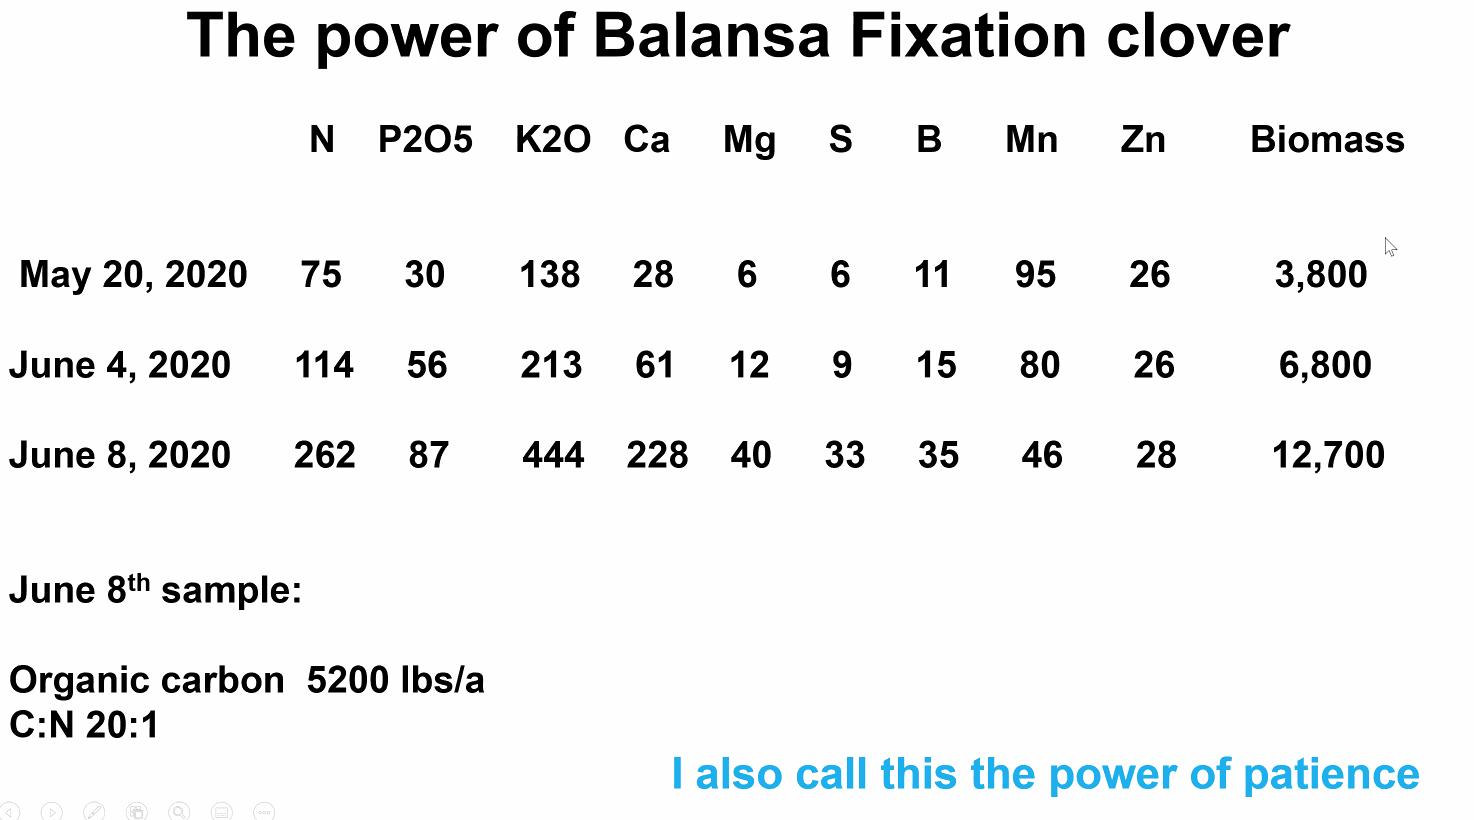 Power of Balansa Clover Fixation